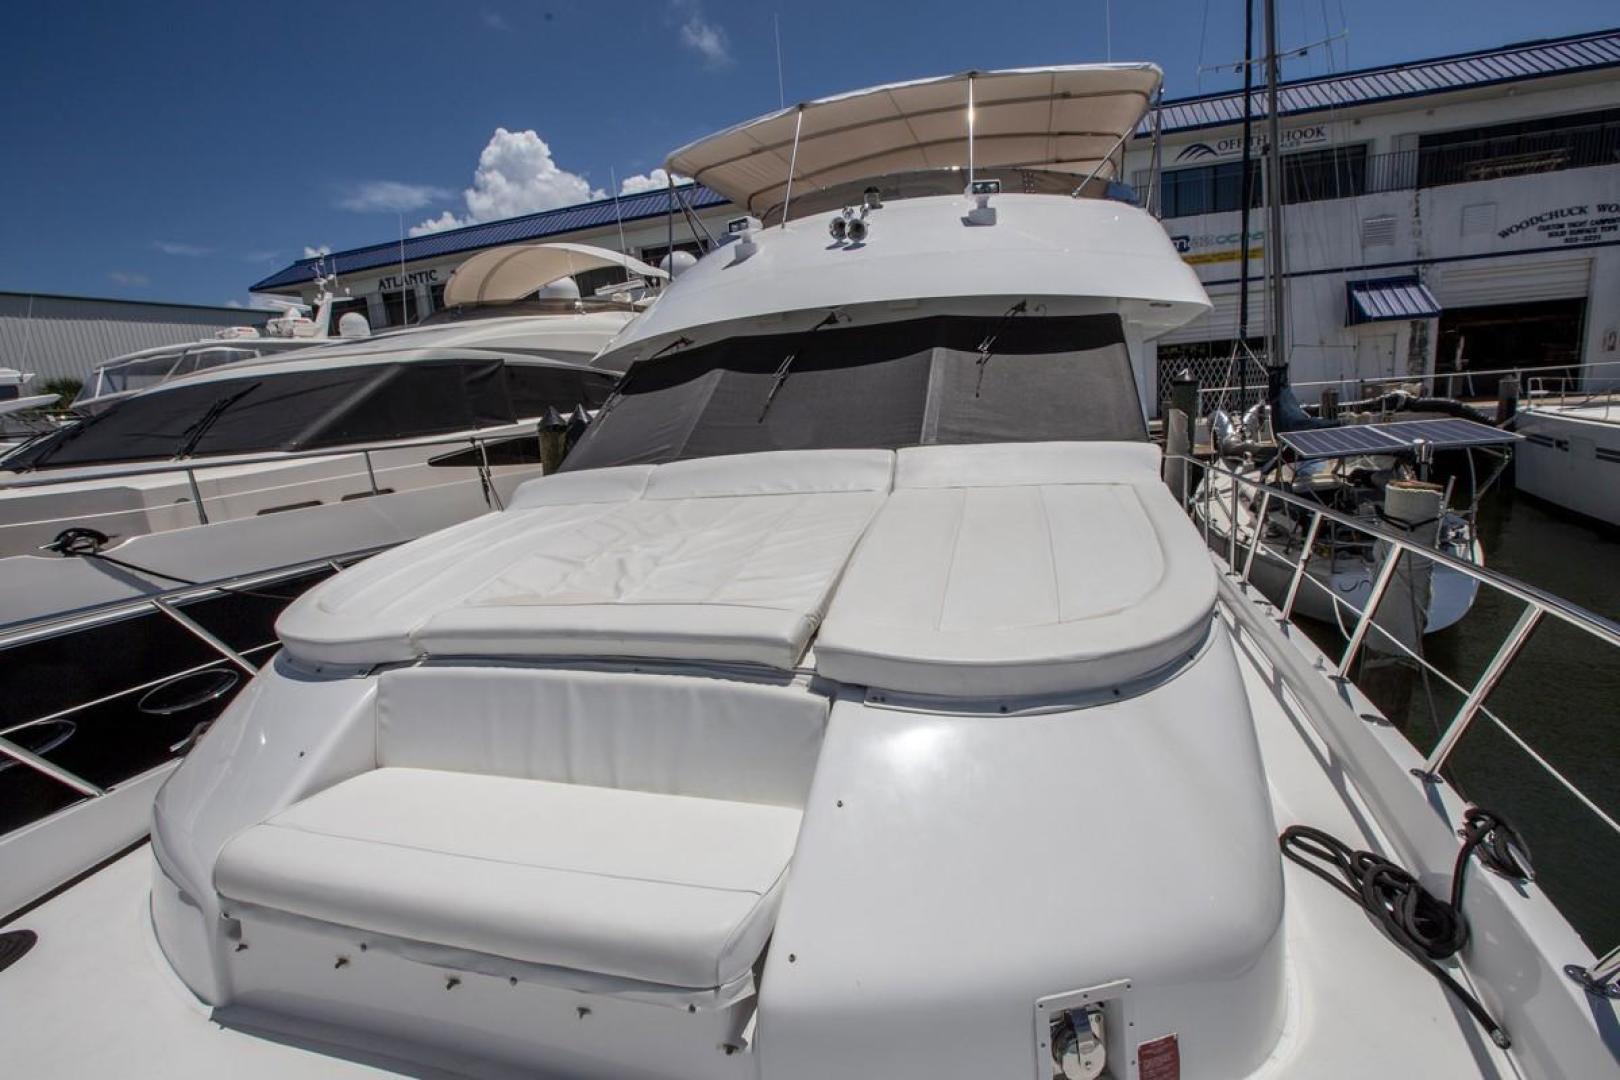 Hatteras-Cockpit Motor Yacht 2000-Getaway Ft. Lauderdale-Florida-United States-977410 | Thumbnail